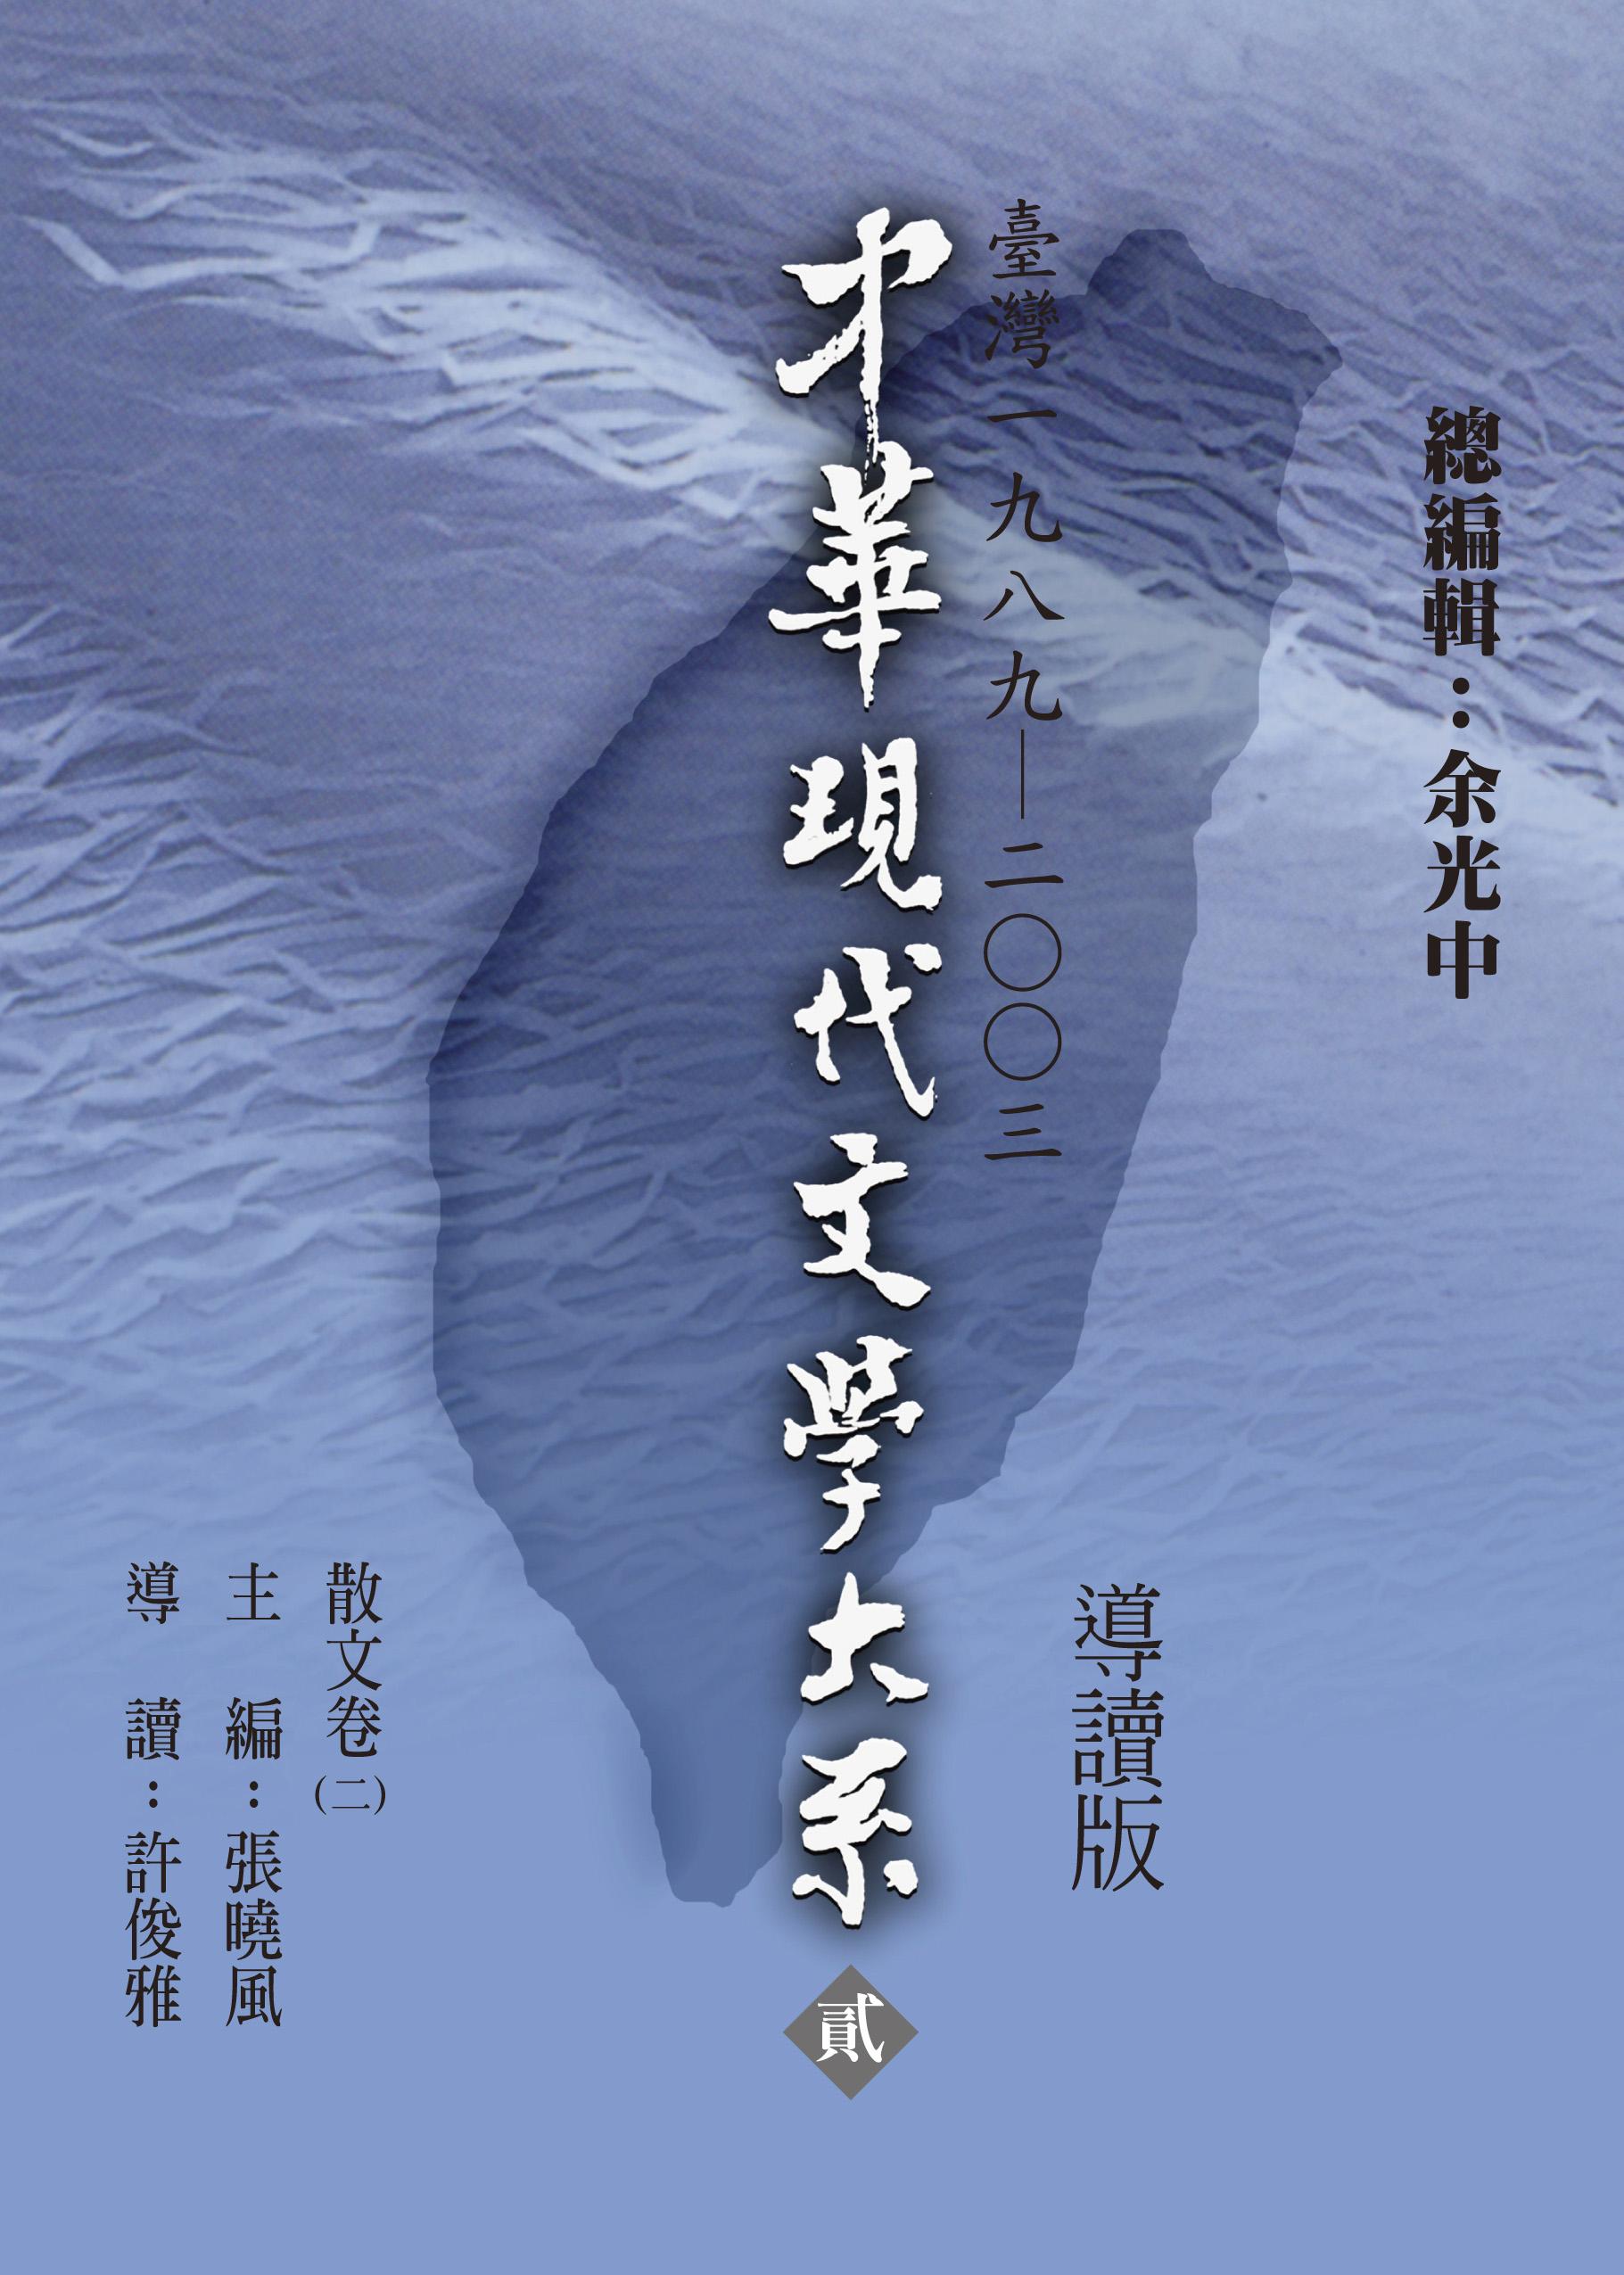 Kk024 中華現代文學大系二散文卷2